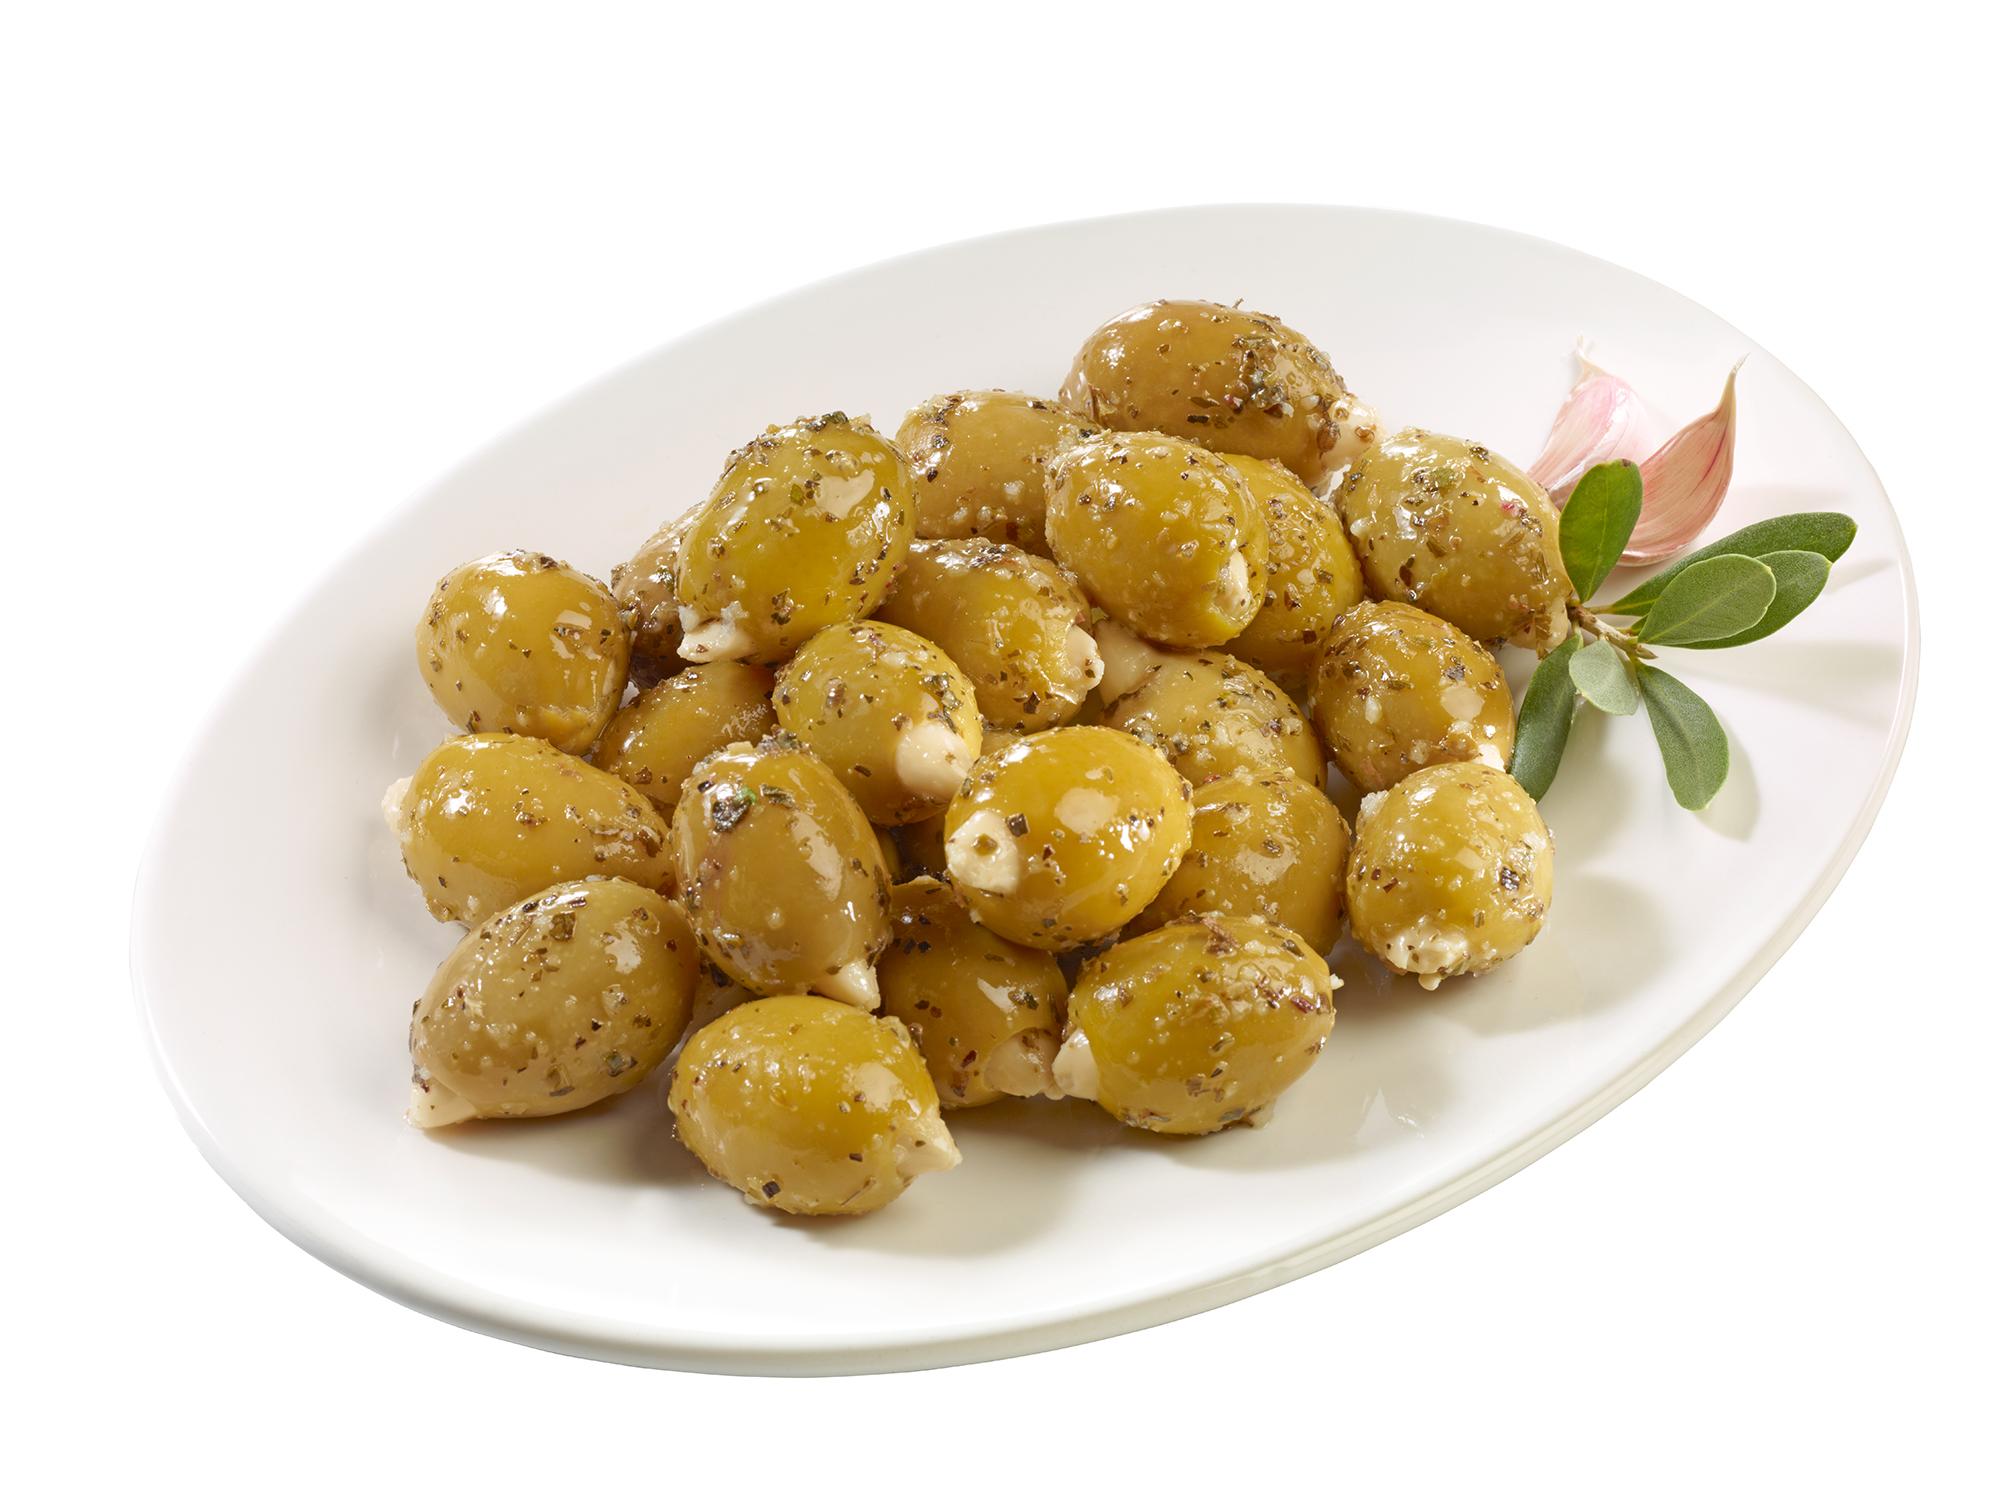 Grüne Oliven mit Mandeln